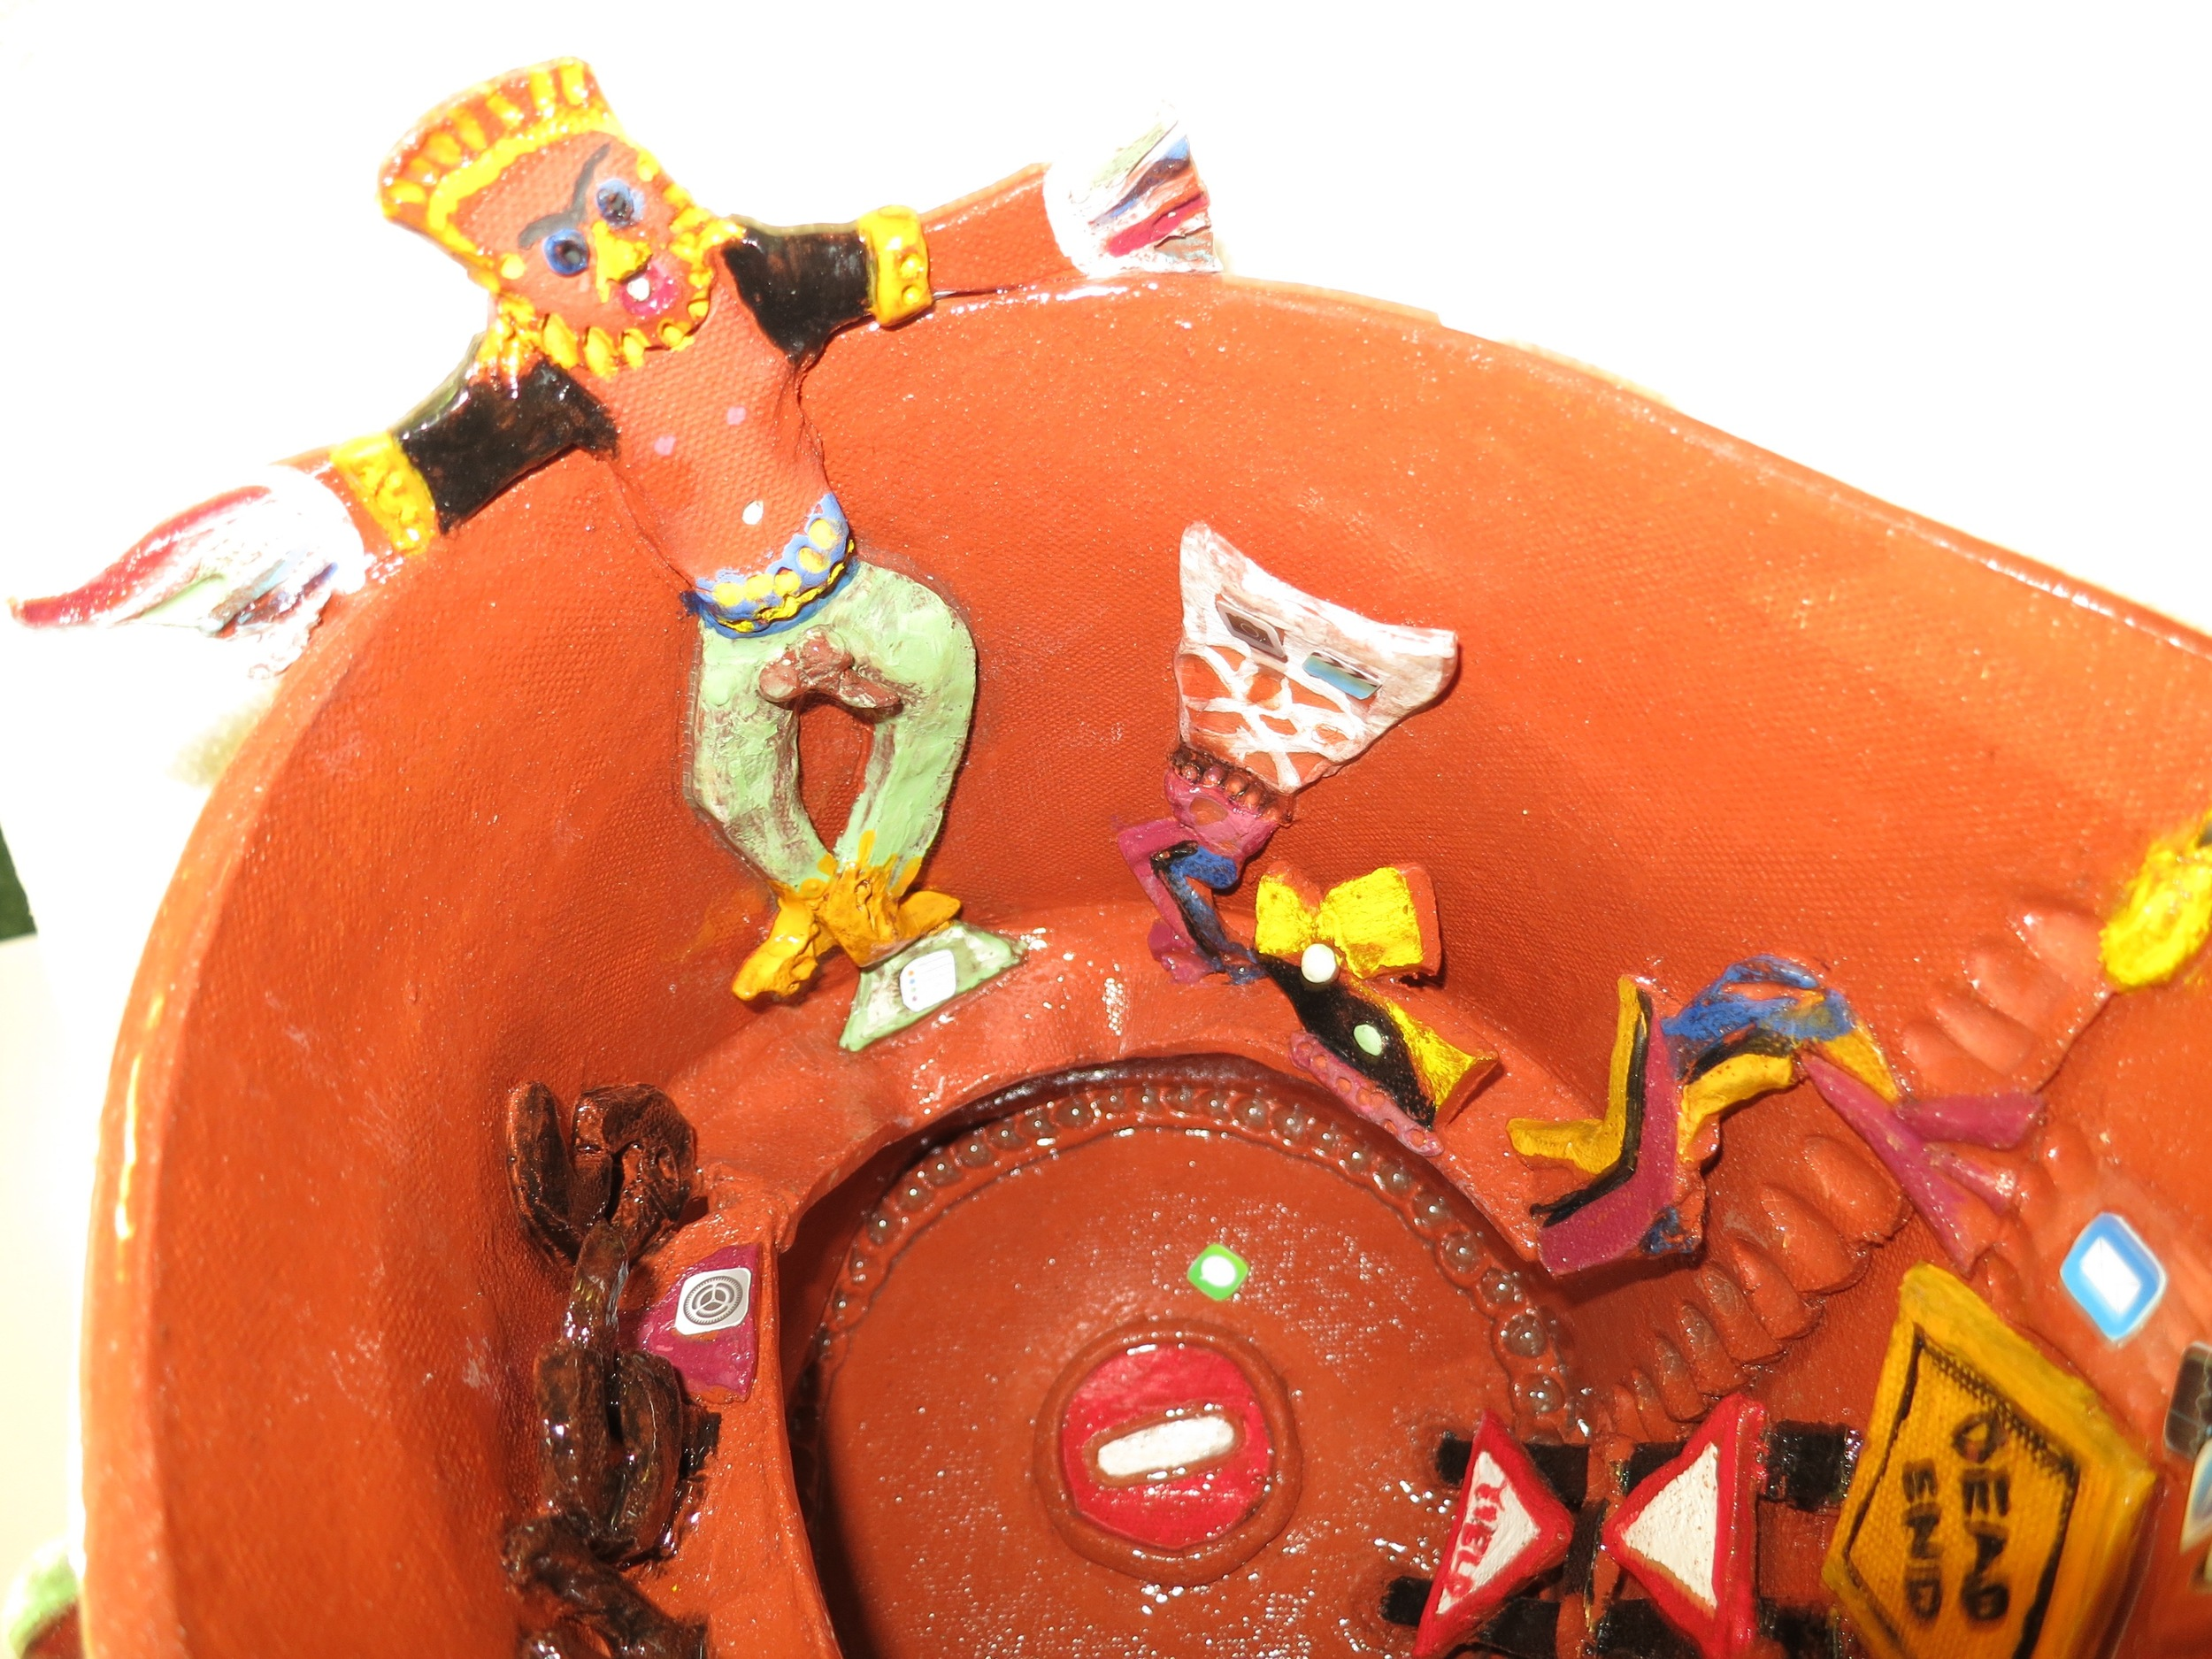 Stuffed, detail of clown_1787.jpg